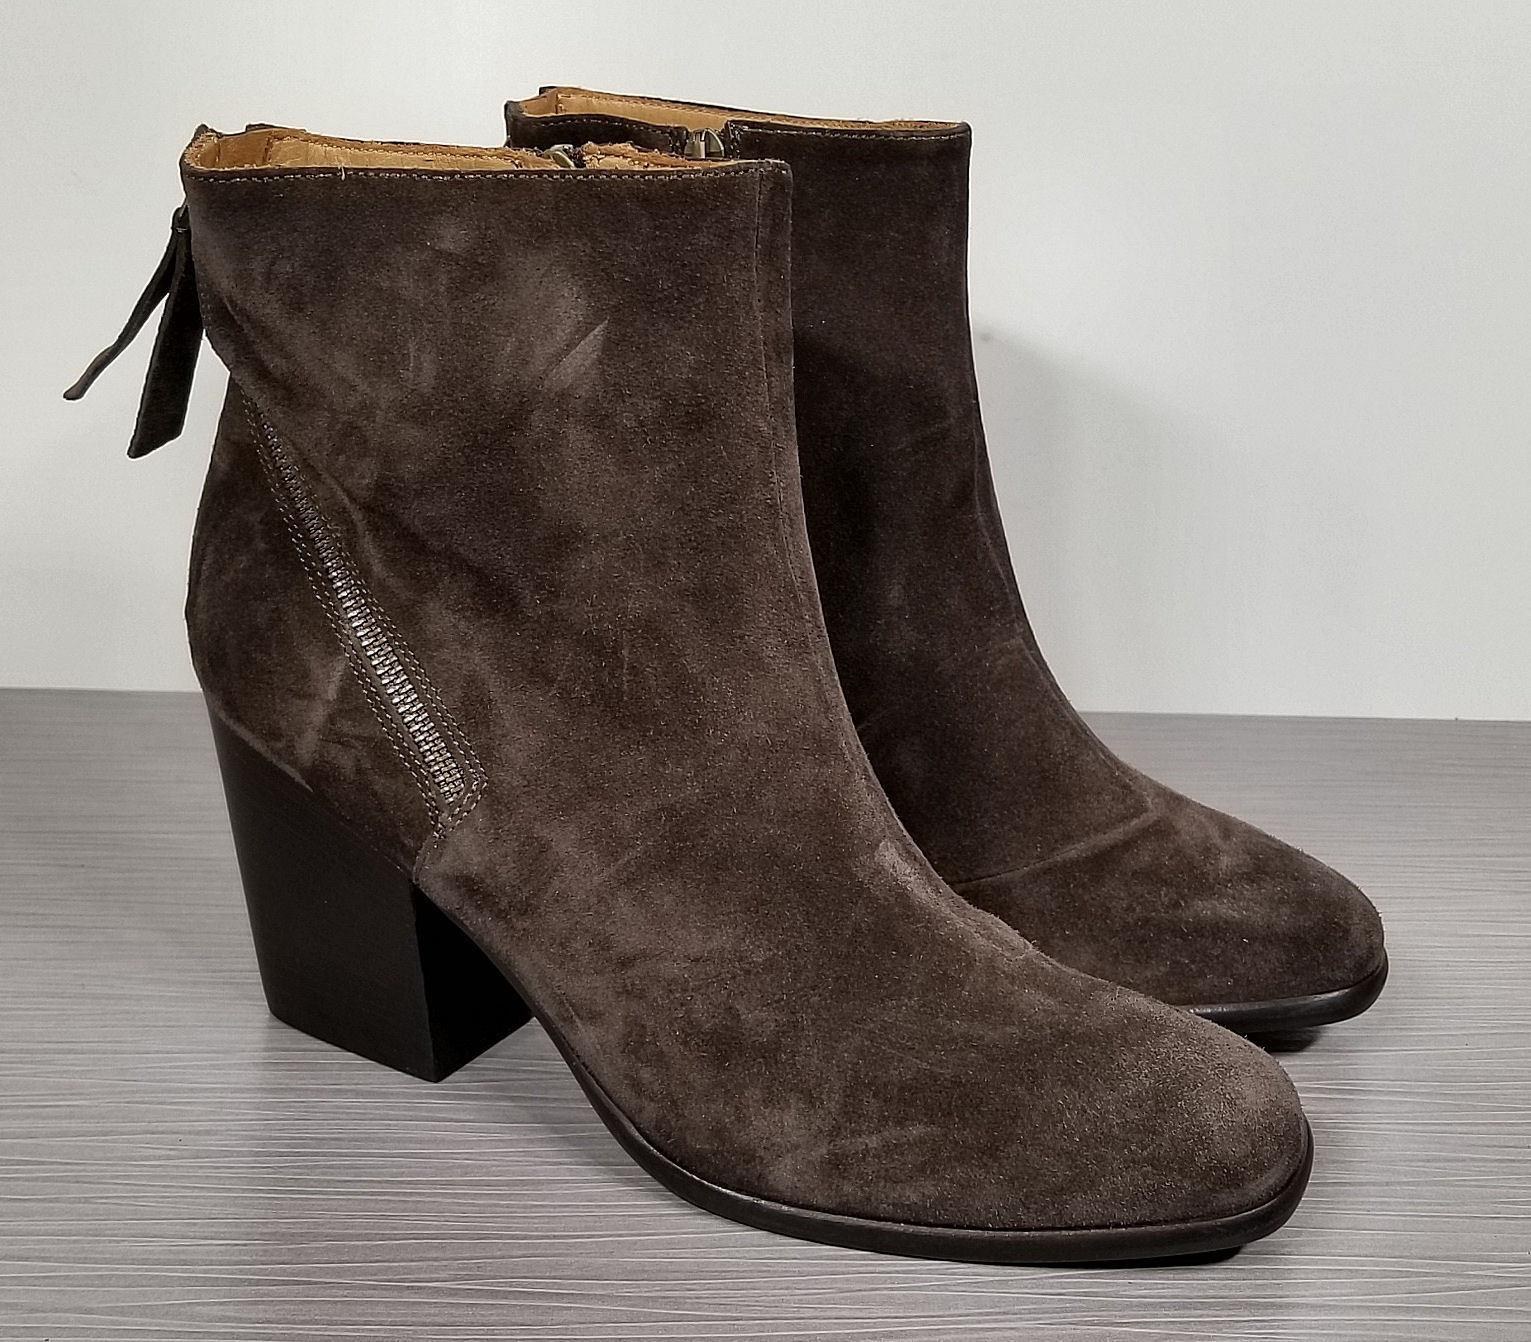 Alberto Fermani Viva Ankle Boot, Tortora (Brown) Suede, Womens Size 11 / 41